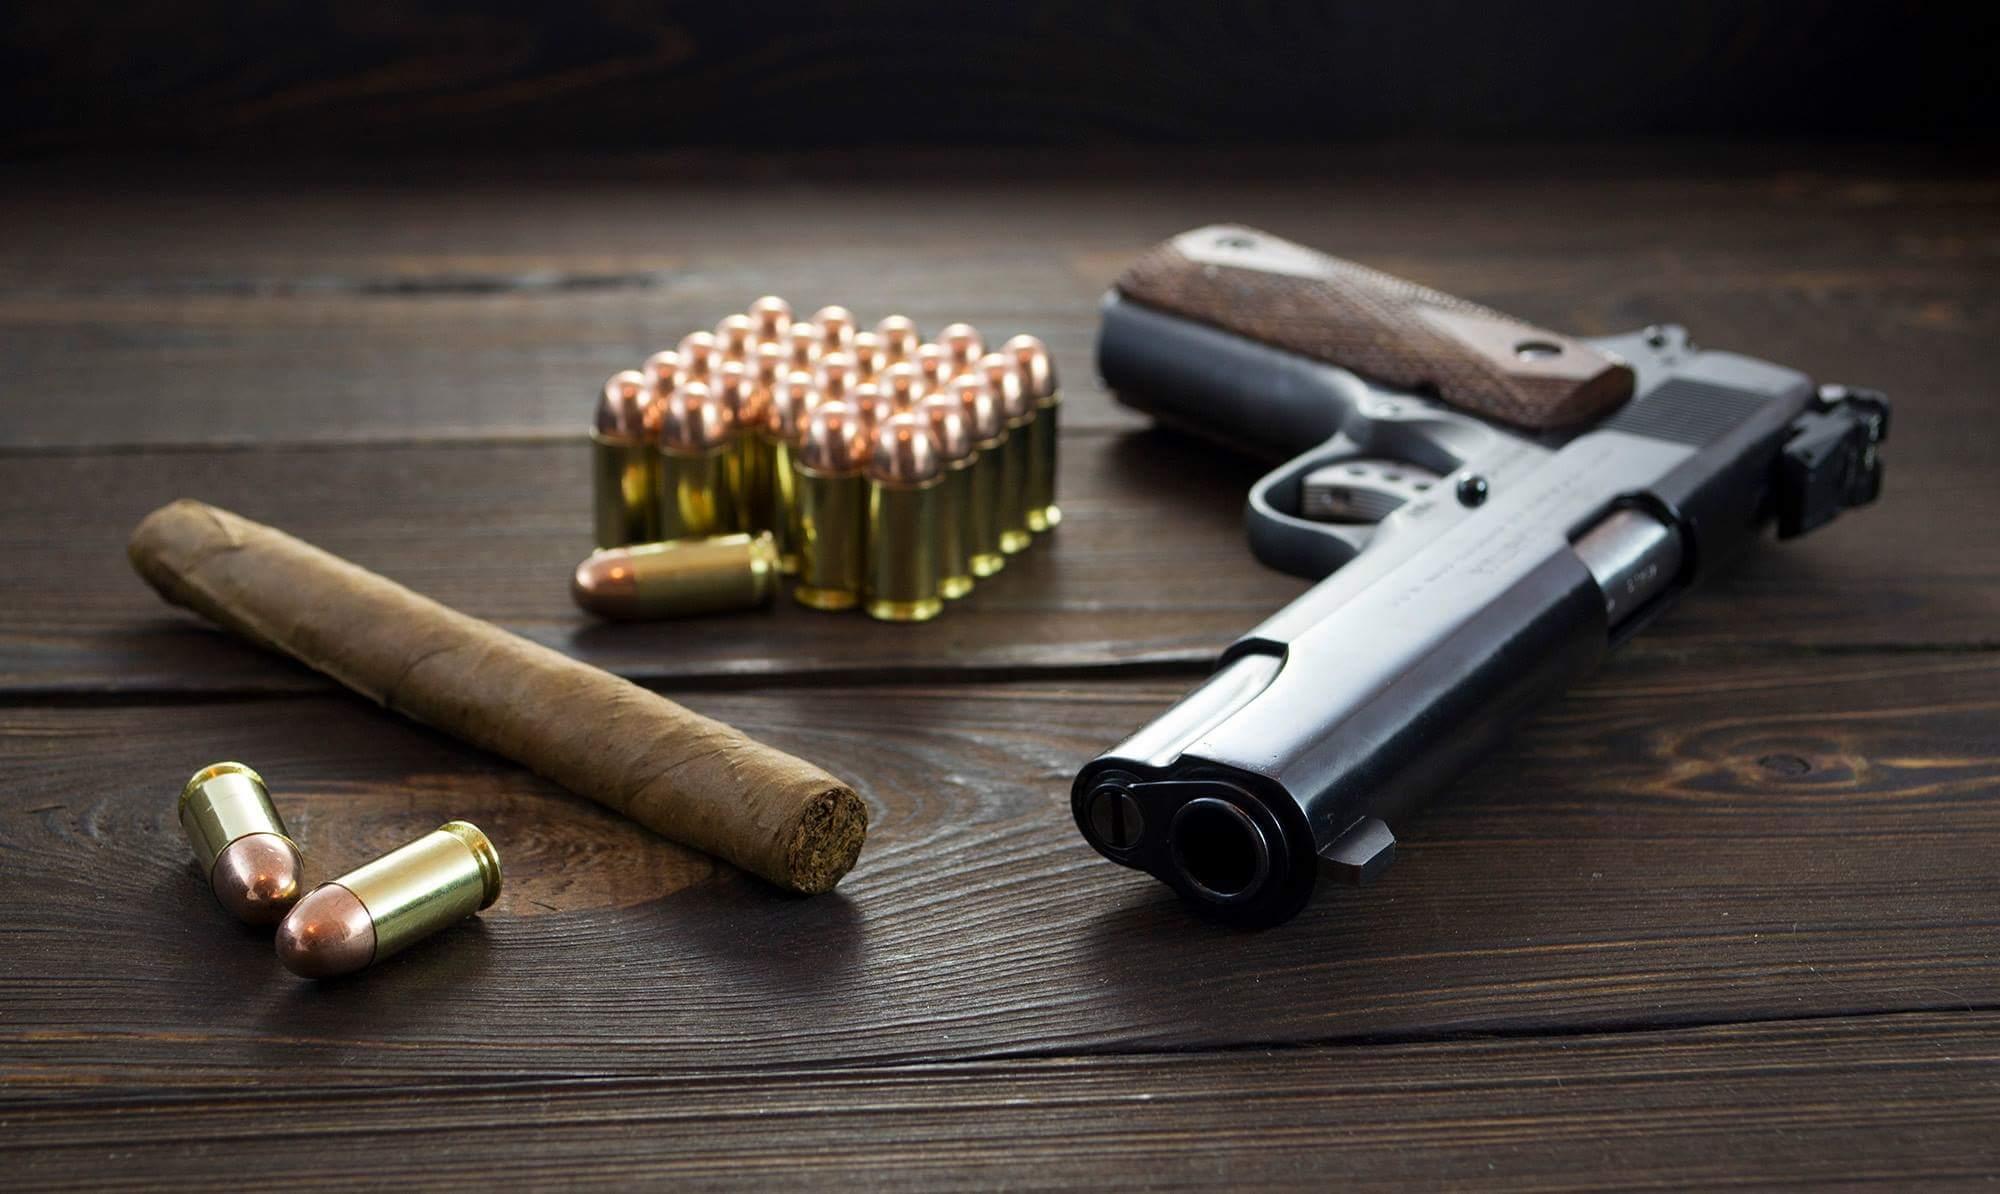 pistolet colt 1911 na drewnianej podłodze